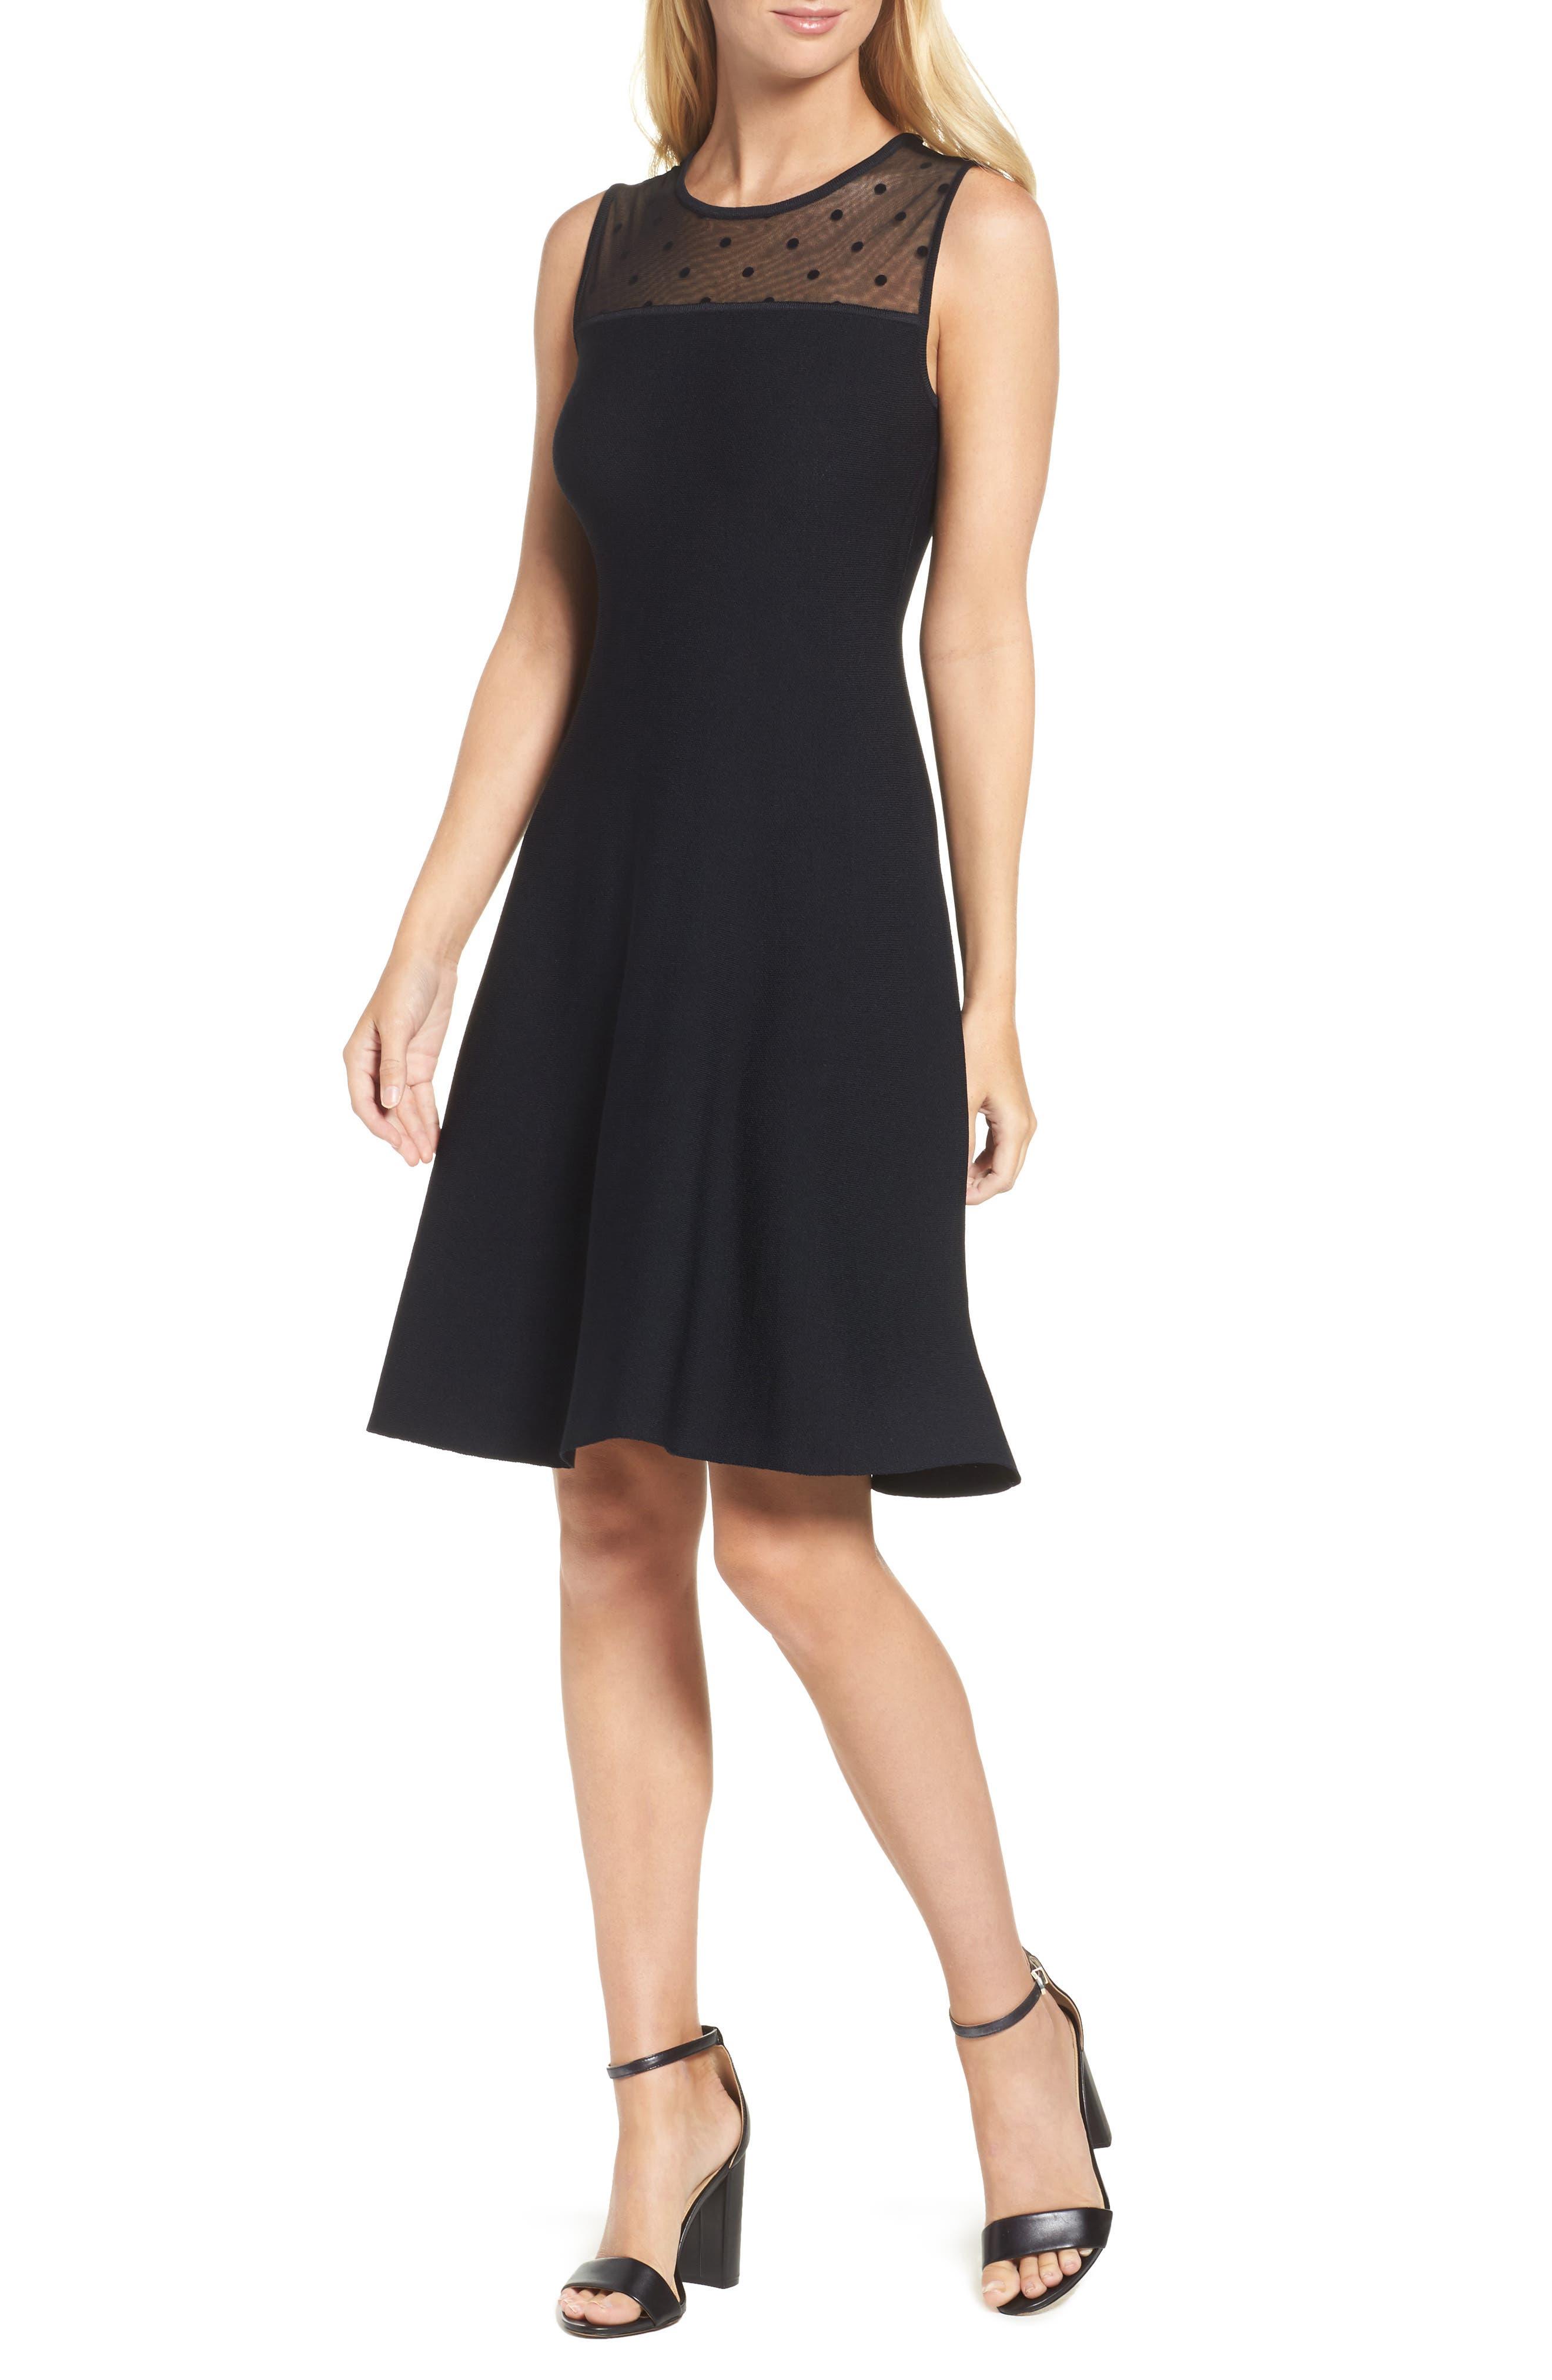 Alternate Image 1 Selected - Eliza J Illusion Yoke Fit & Flare Dress